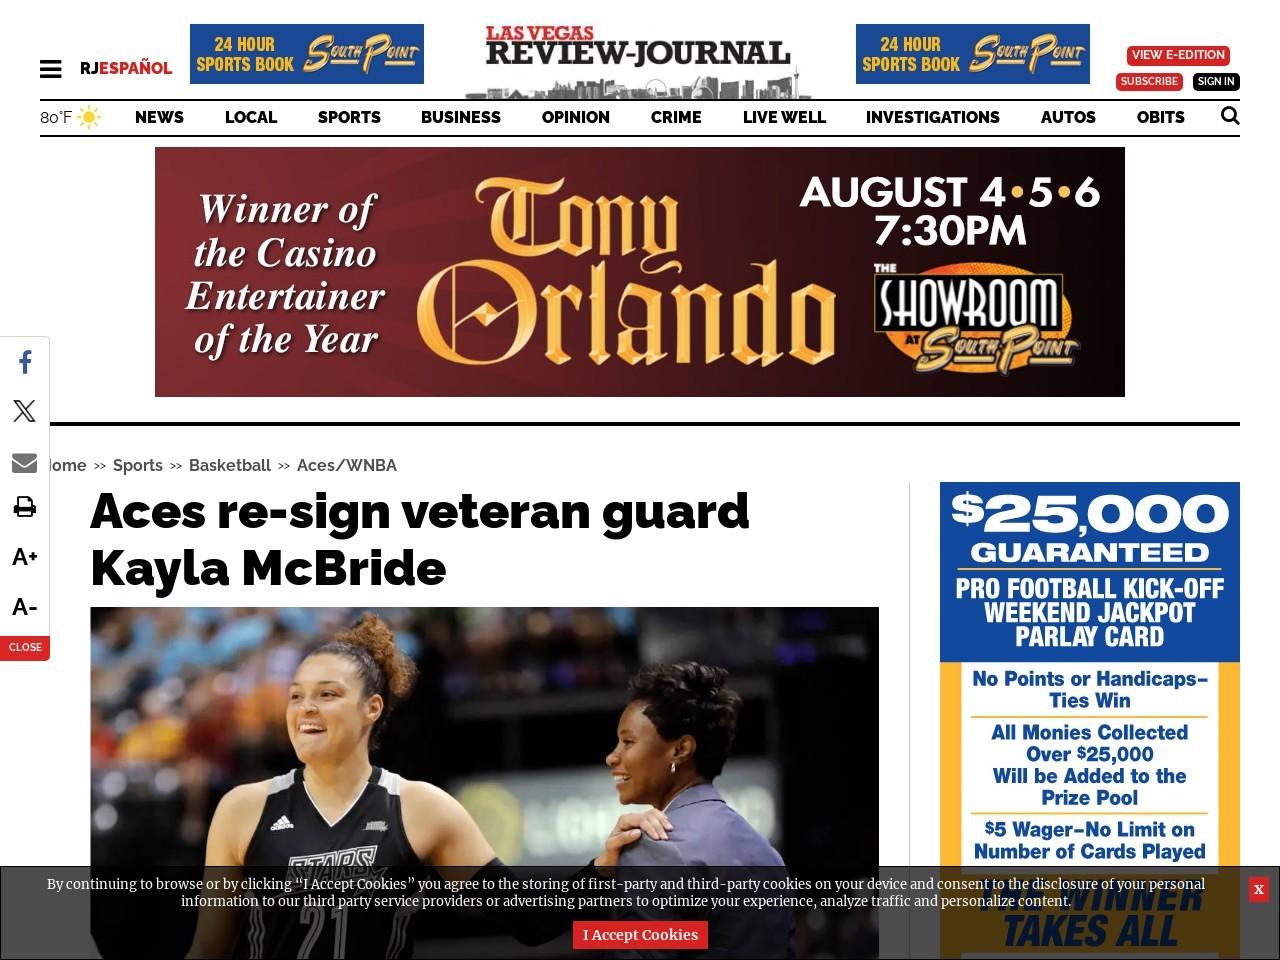 Aces re-sign veteran guard Kayla McBride